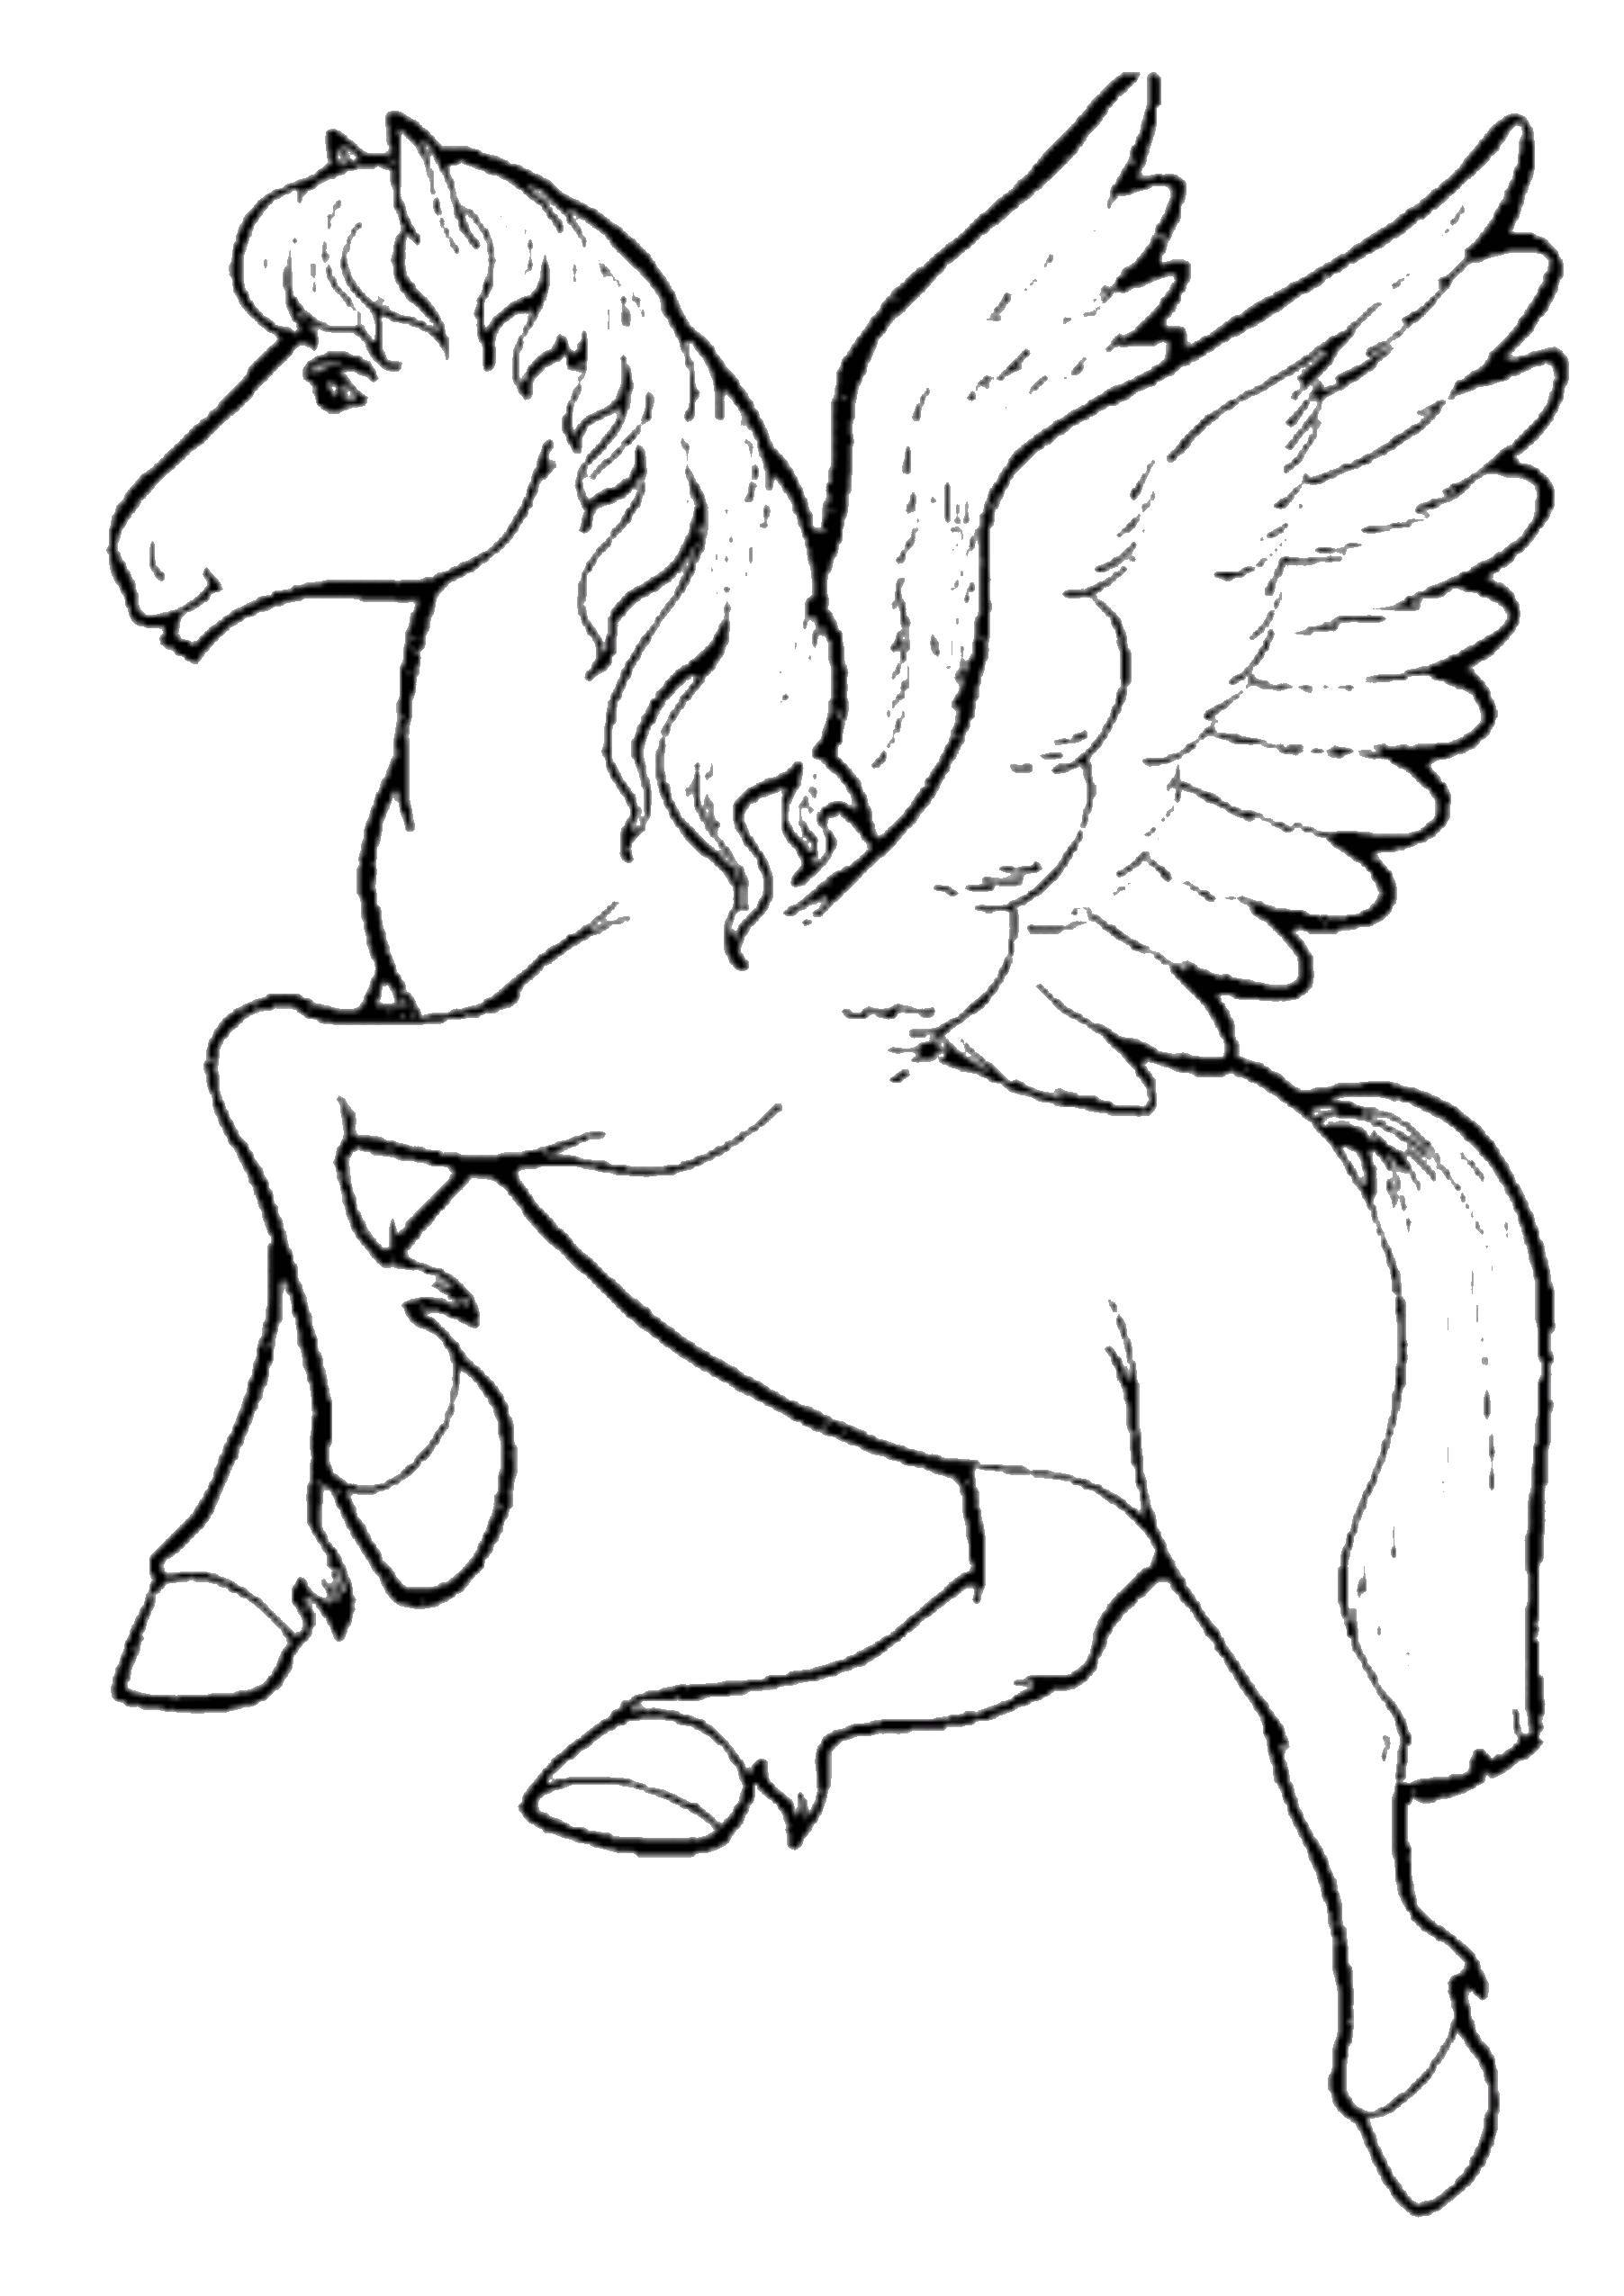 Раскраски игры, Раскраска Майнкрафт персонажи игры майнкрафт.